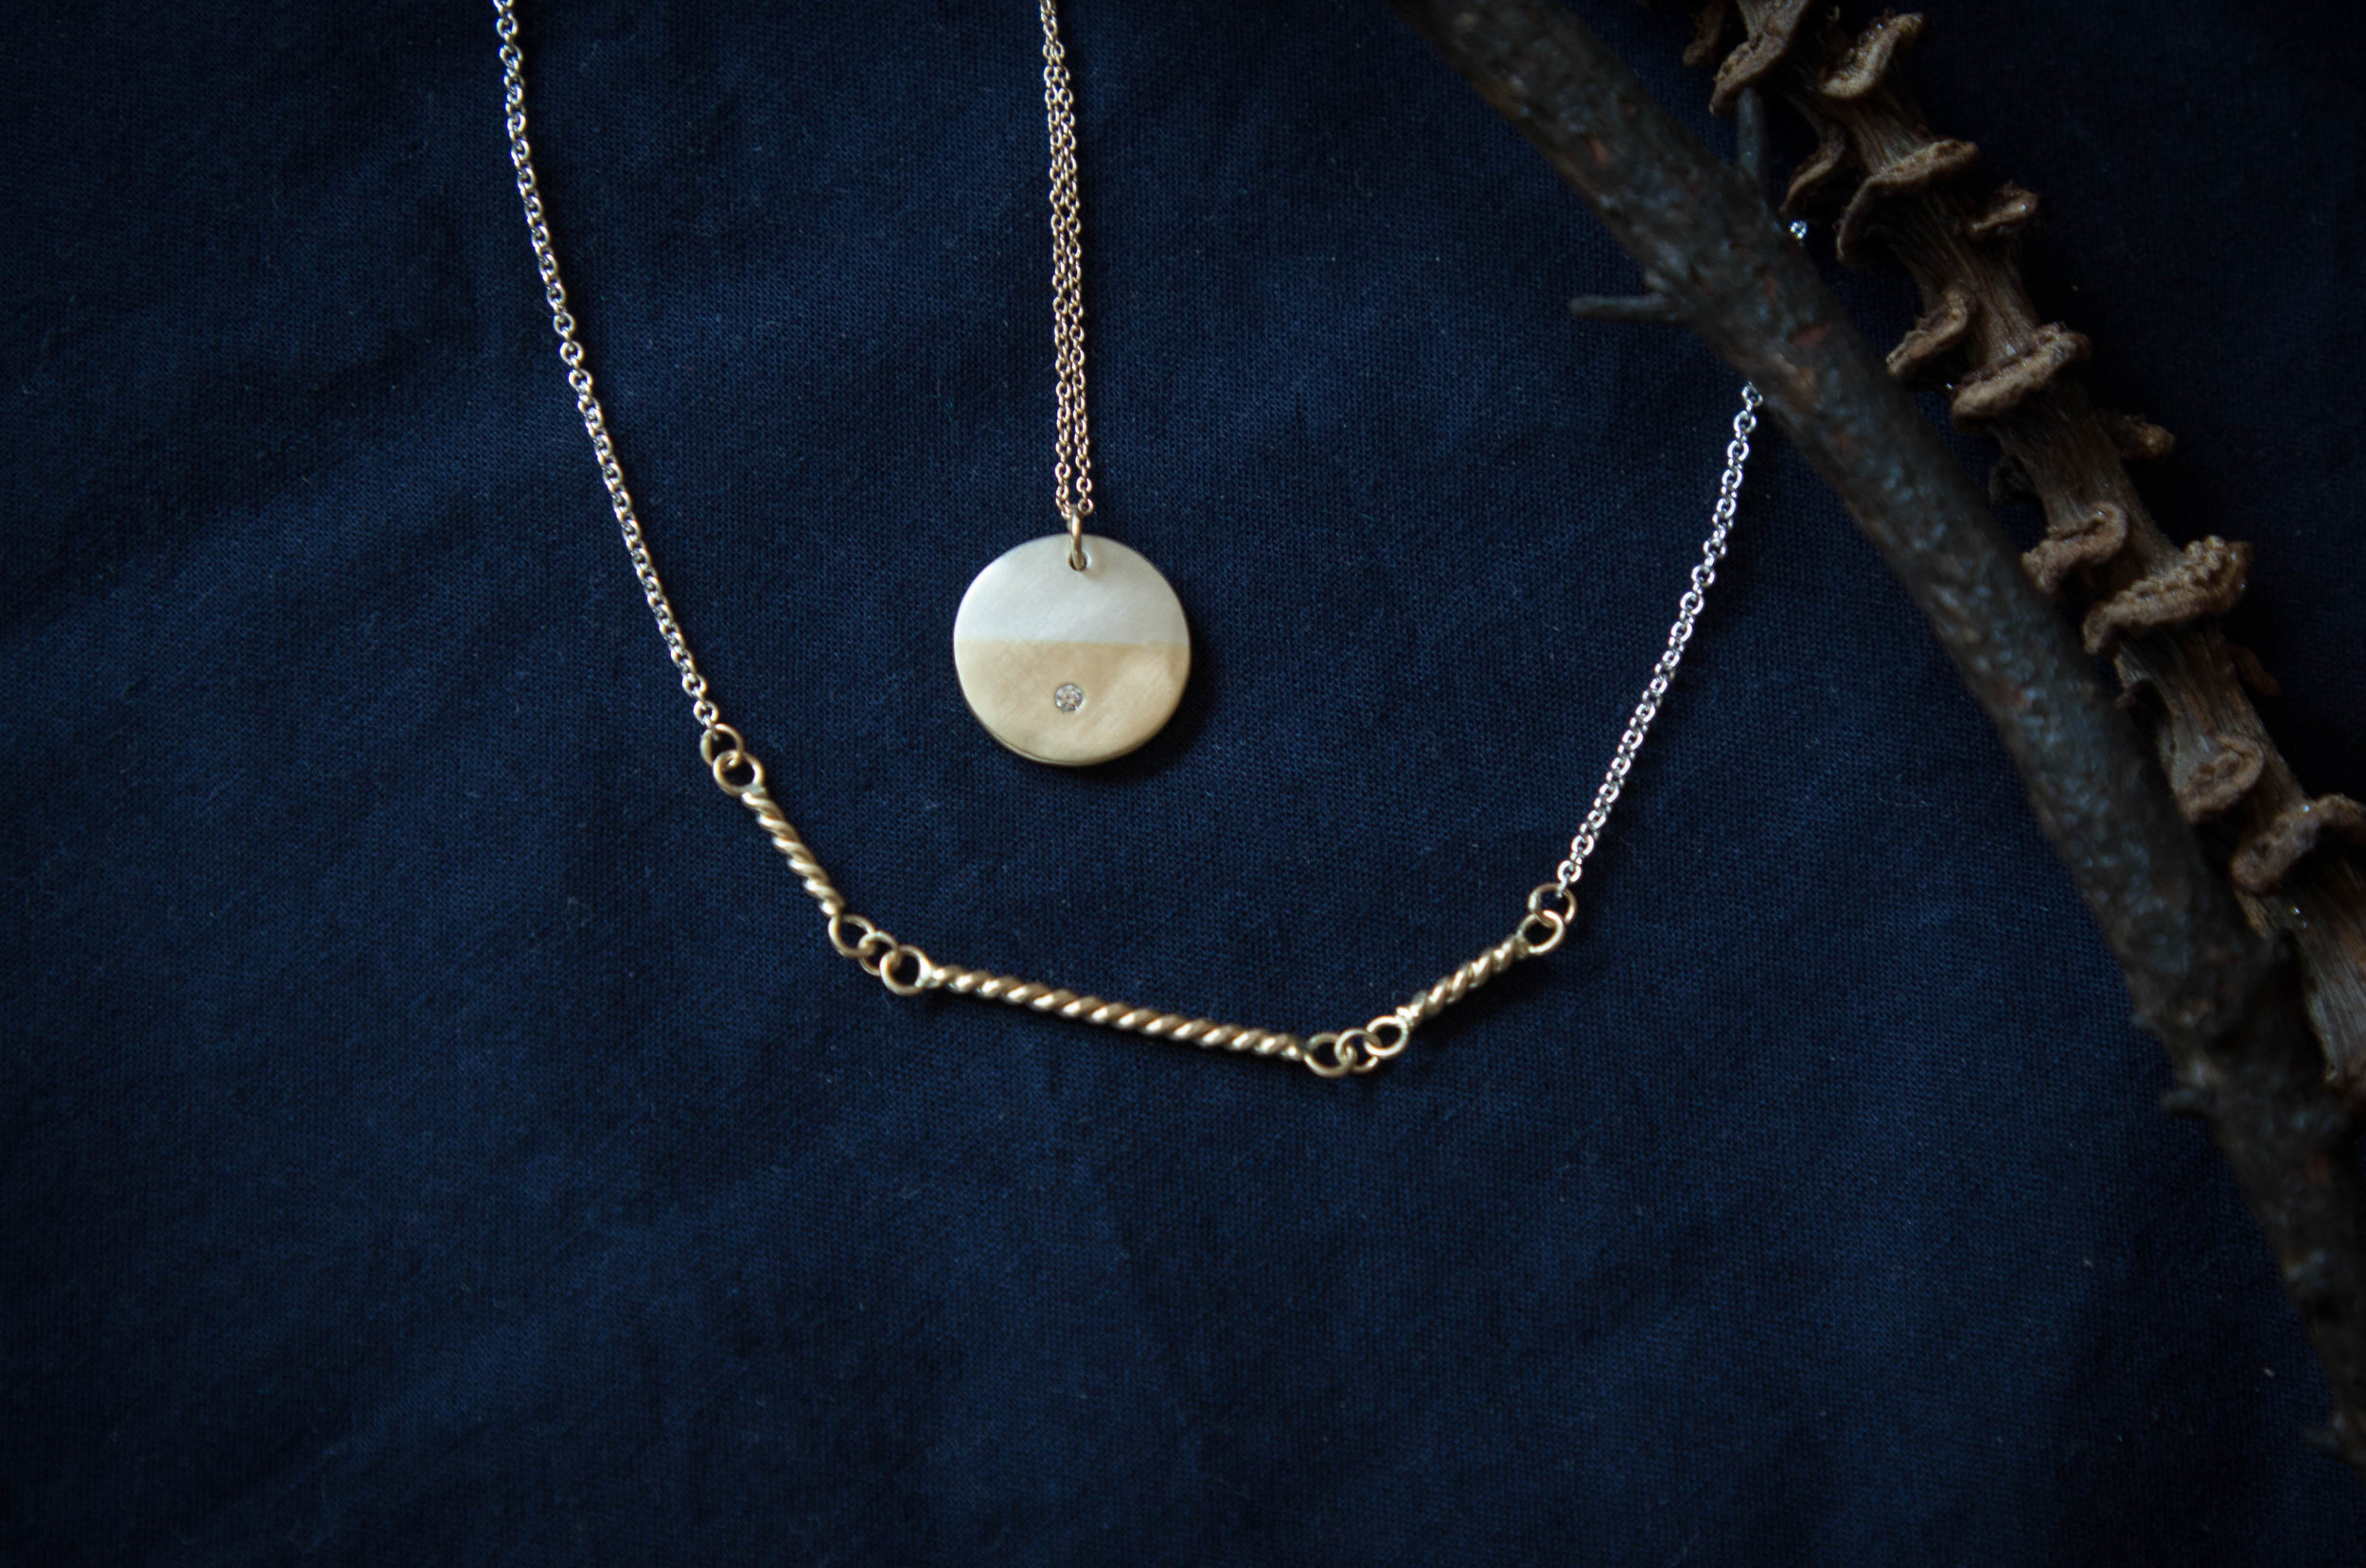 sunrise diamond and rope jardin necklaces.jpg